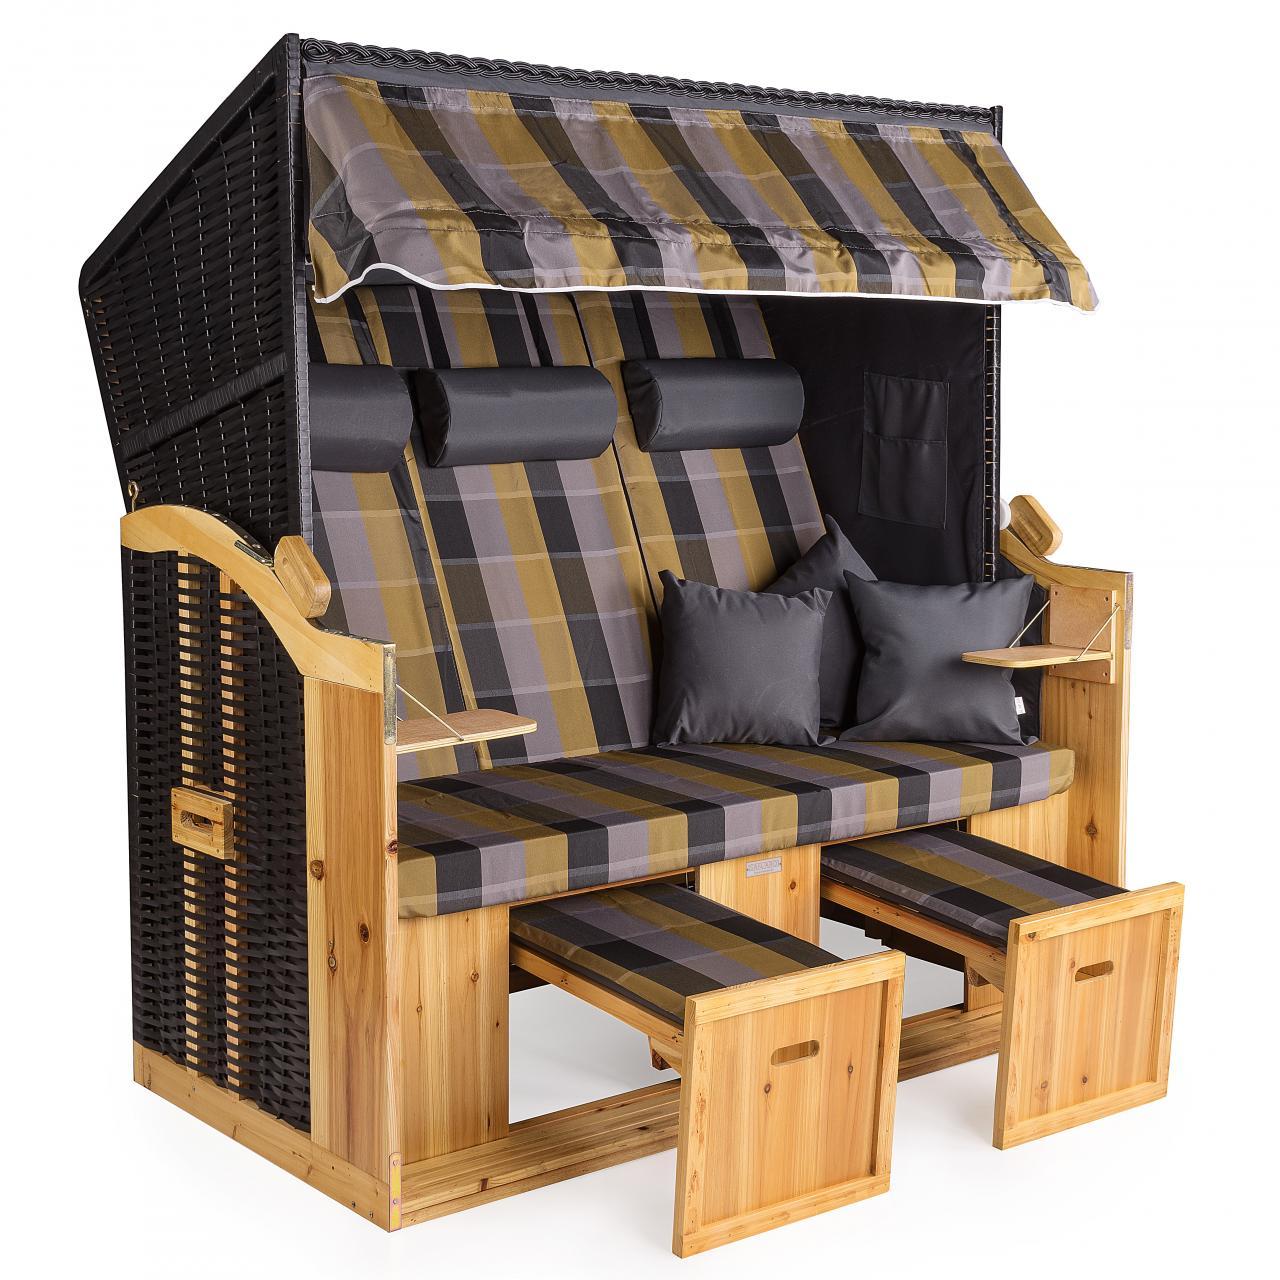 strandkorb xxl deluxe 160cm volllieger gartenliege ostsee nordsee gartenm bel ebay. Black Bedroom Furniture Sets. Home Design Ideas